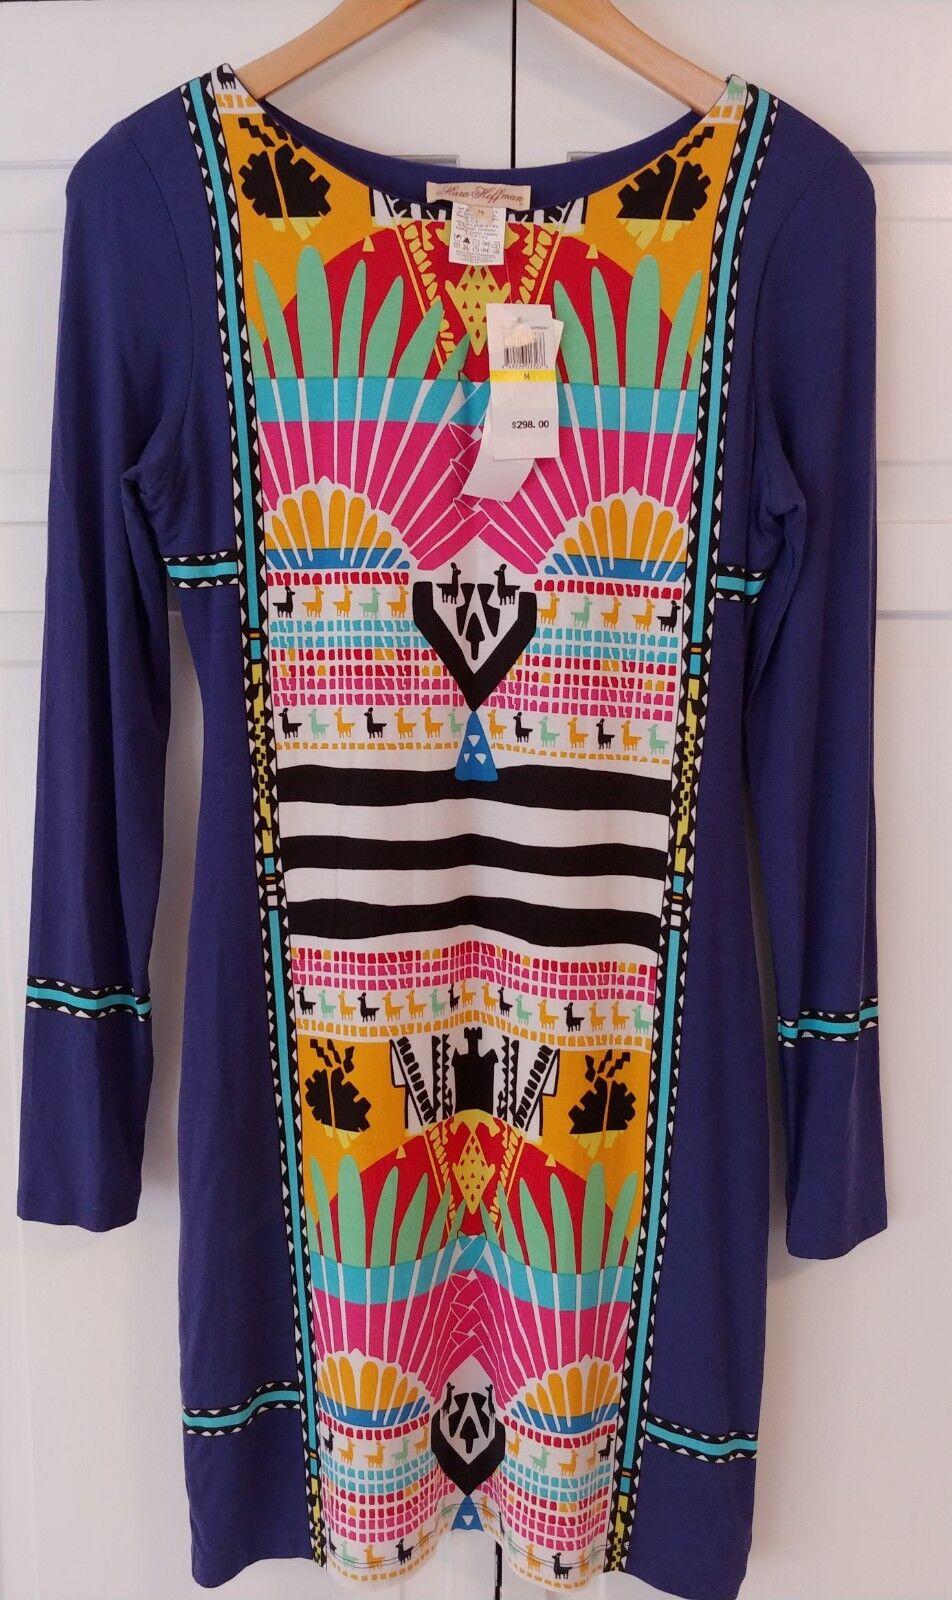 MARA HOFFMAN Sunrise Aztec Print Llama Body con Dress Size Medium NWT  298